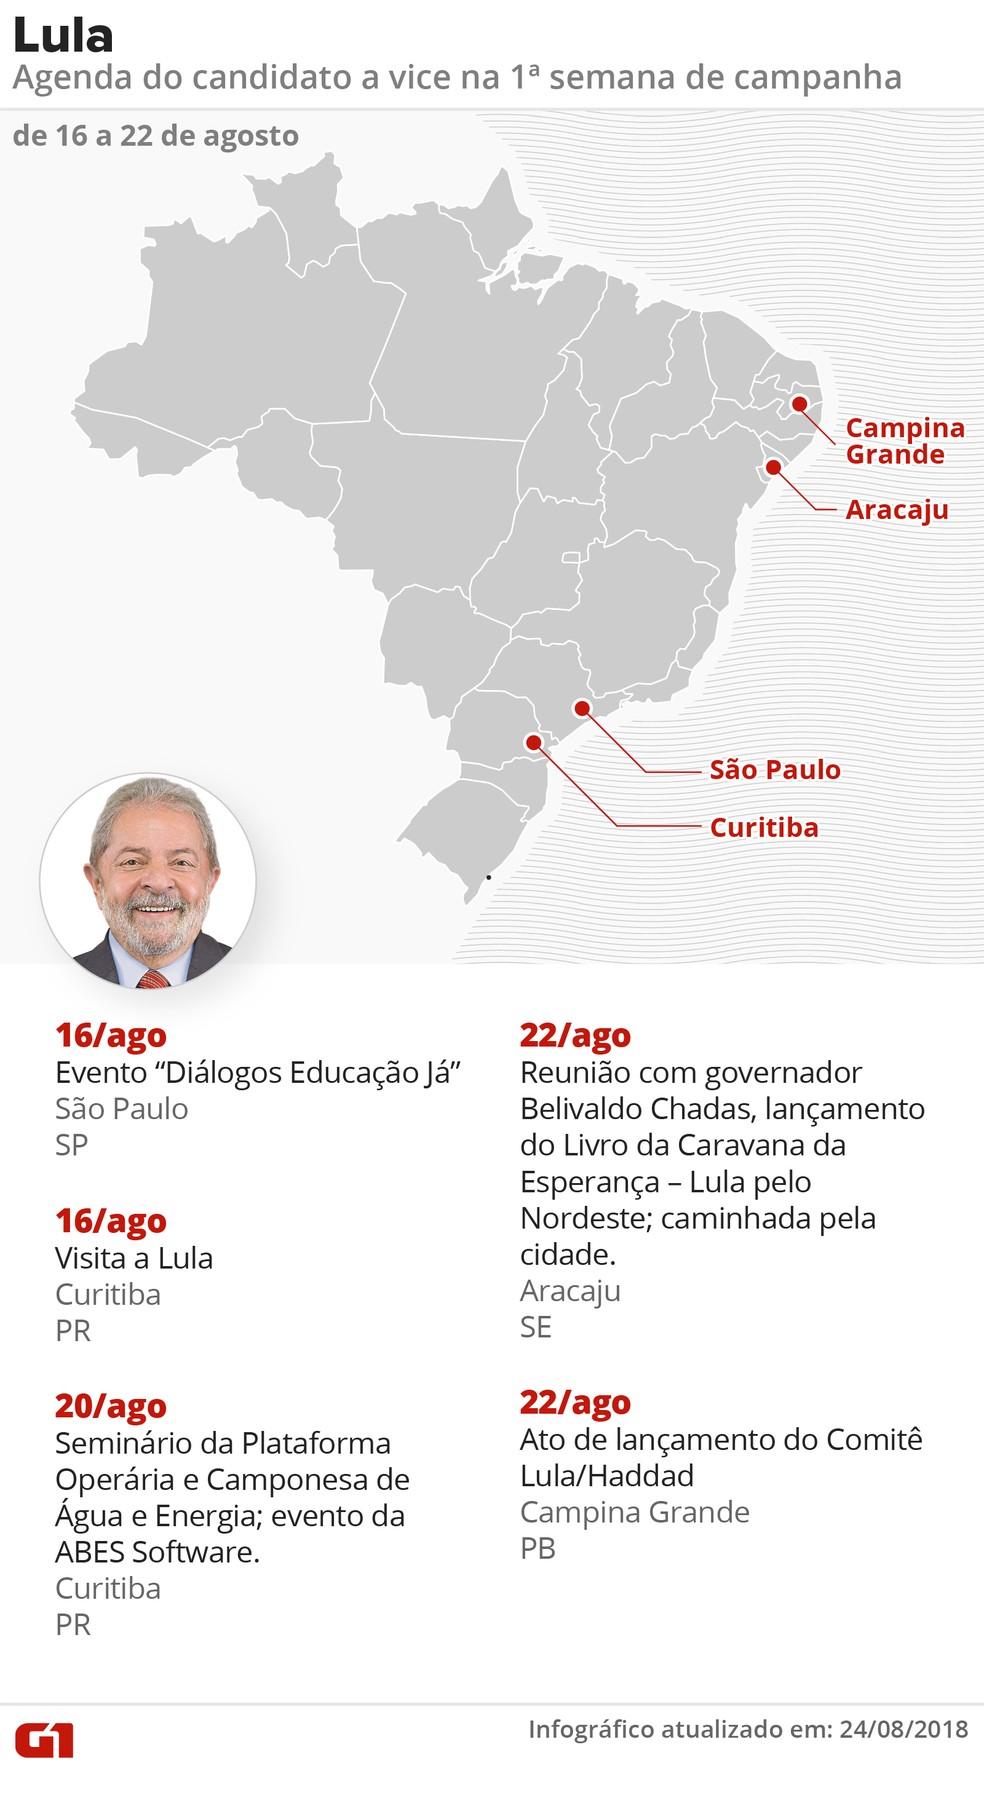 Agenda de Lula (PT), representado por Fernando Haddad, na primeira semanada campanha presidencial (Foto: Alexandre Mauro, Roberta Jaworski, Igor Estrella e Juliane Souza/G1)